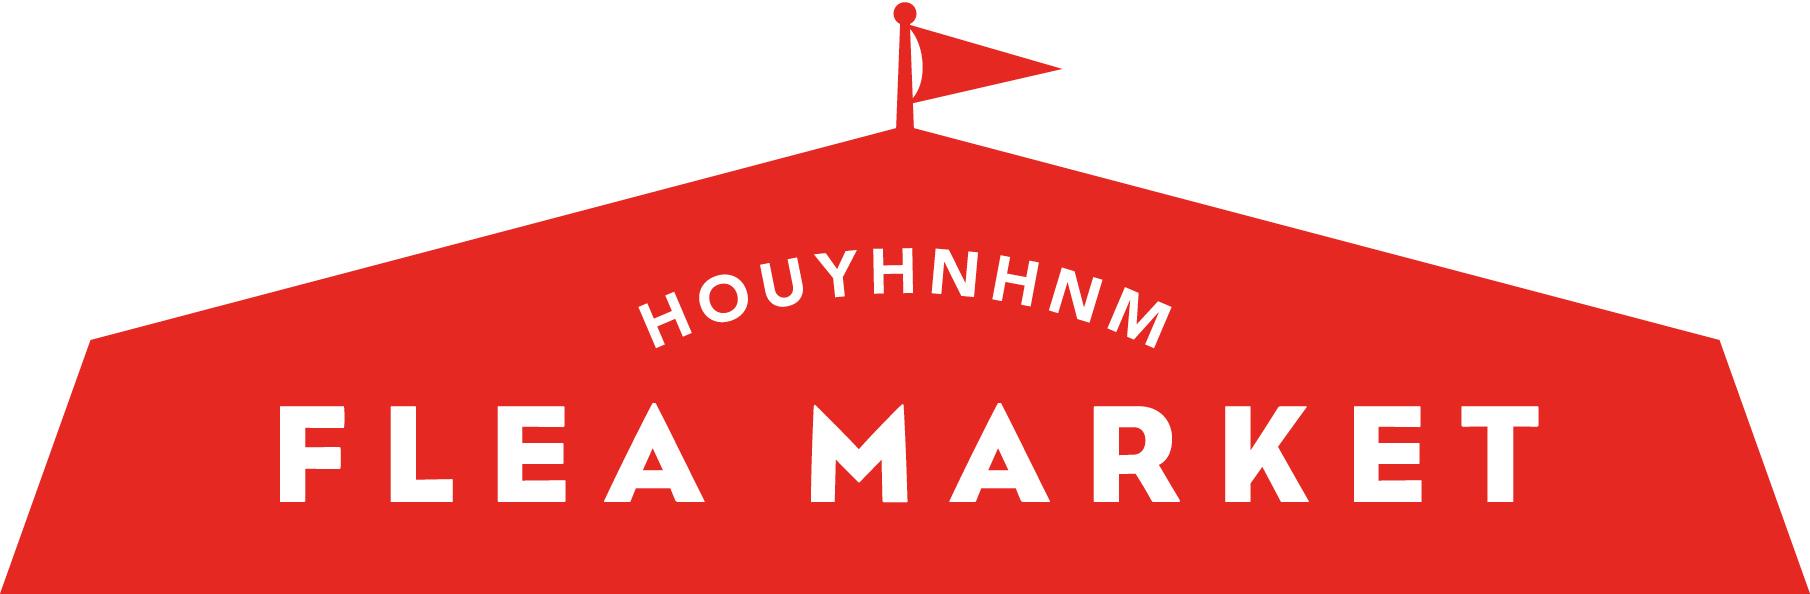 HOUYHNHNM FLEA MARKET